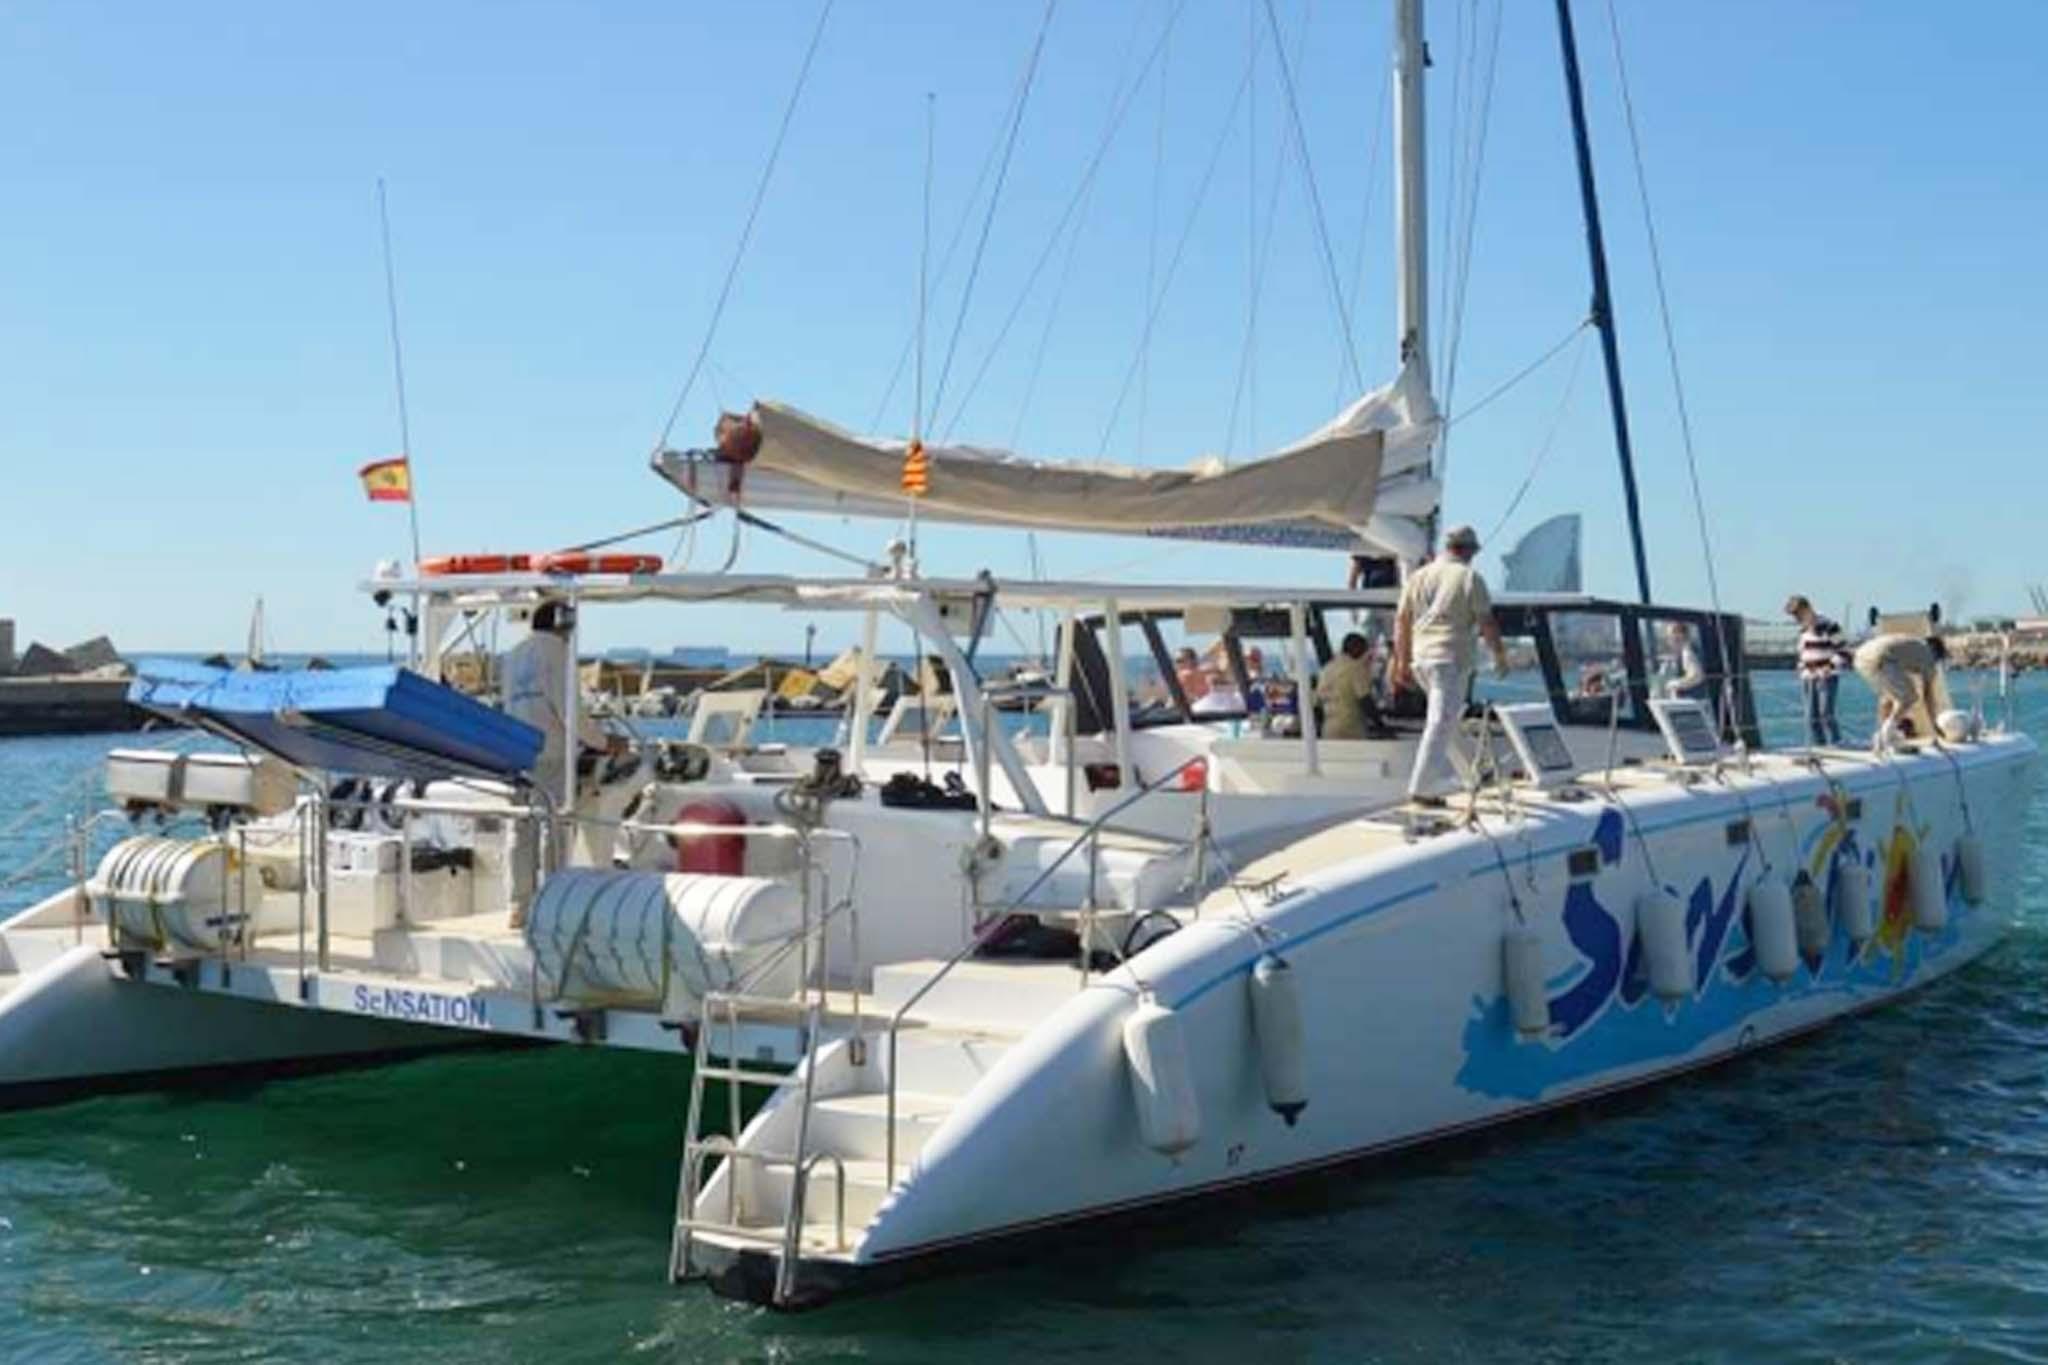 Alquiler Catamaran Sitges 2